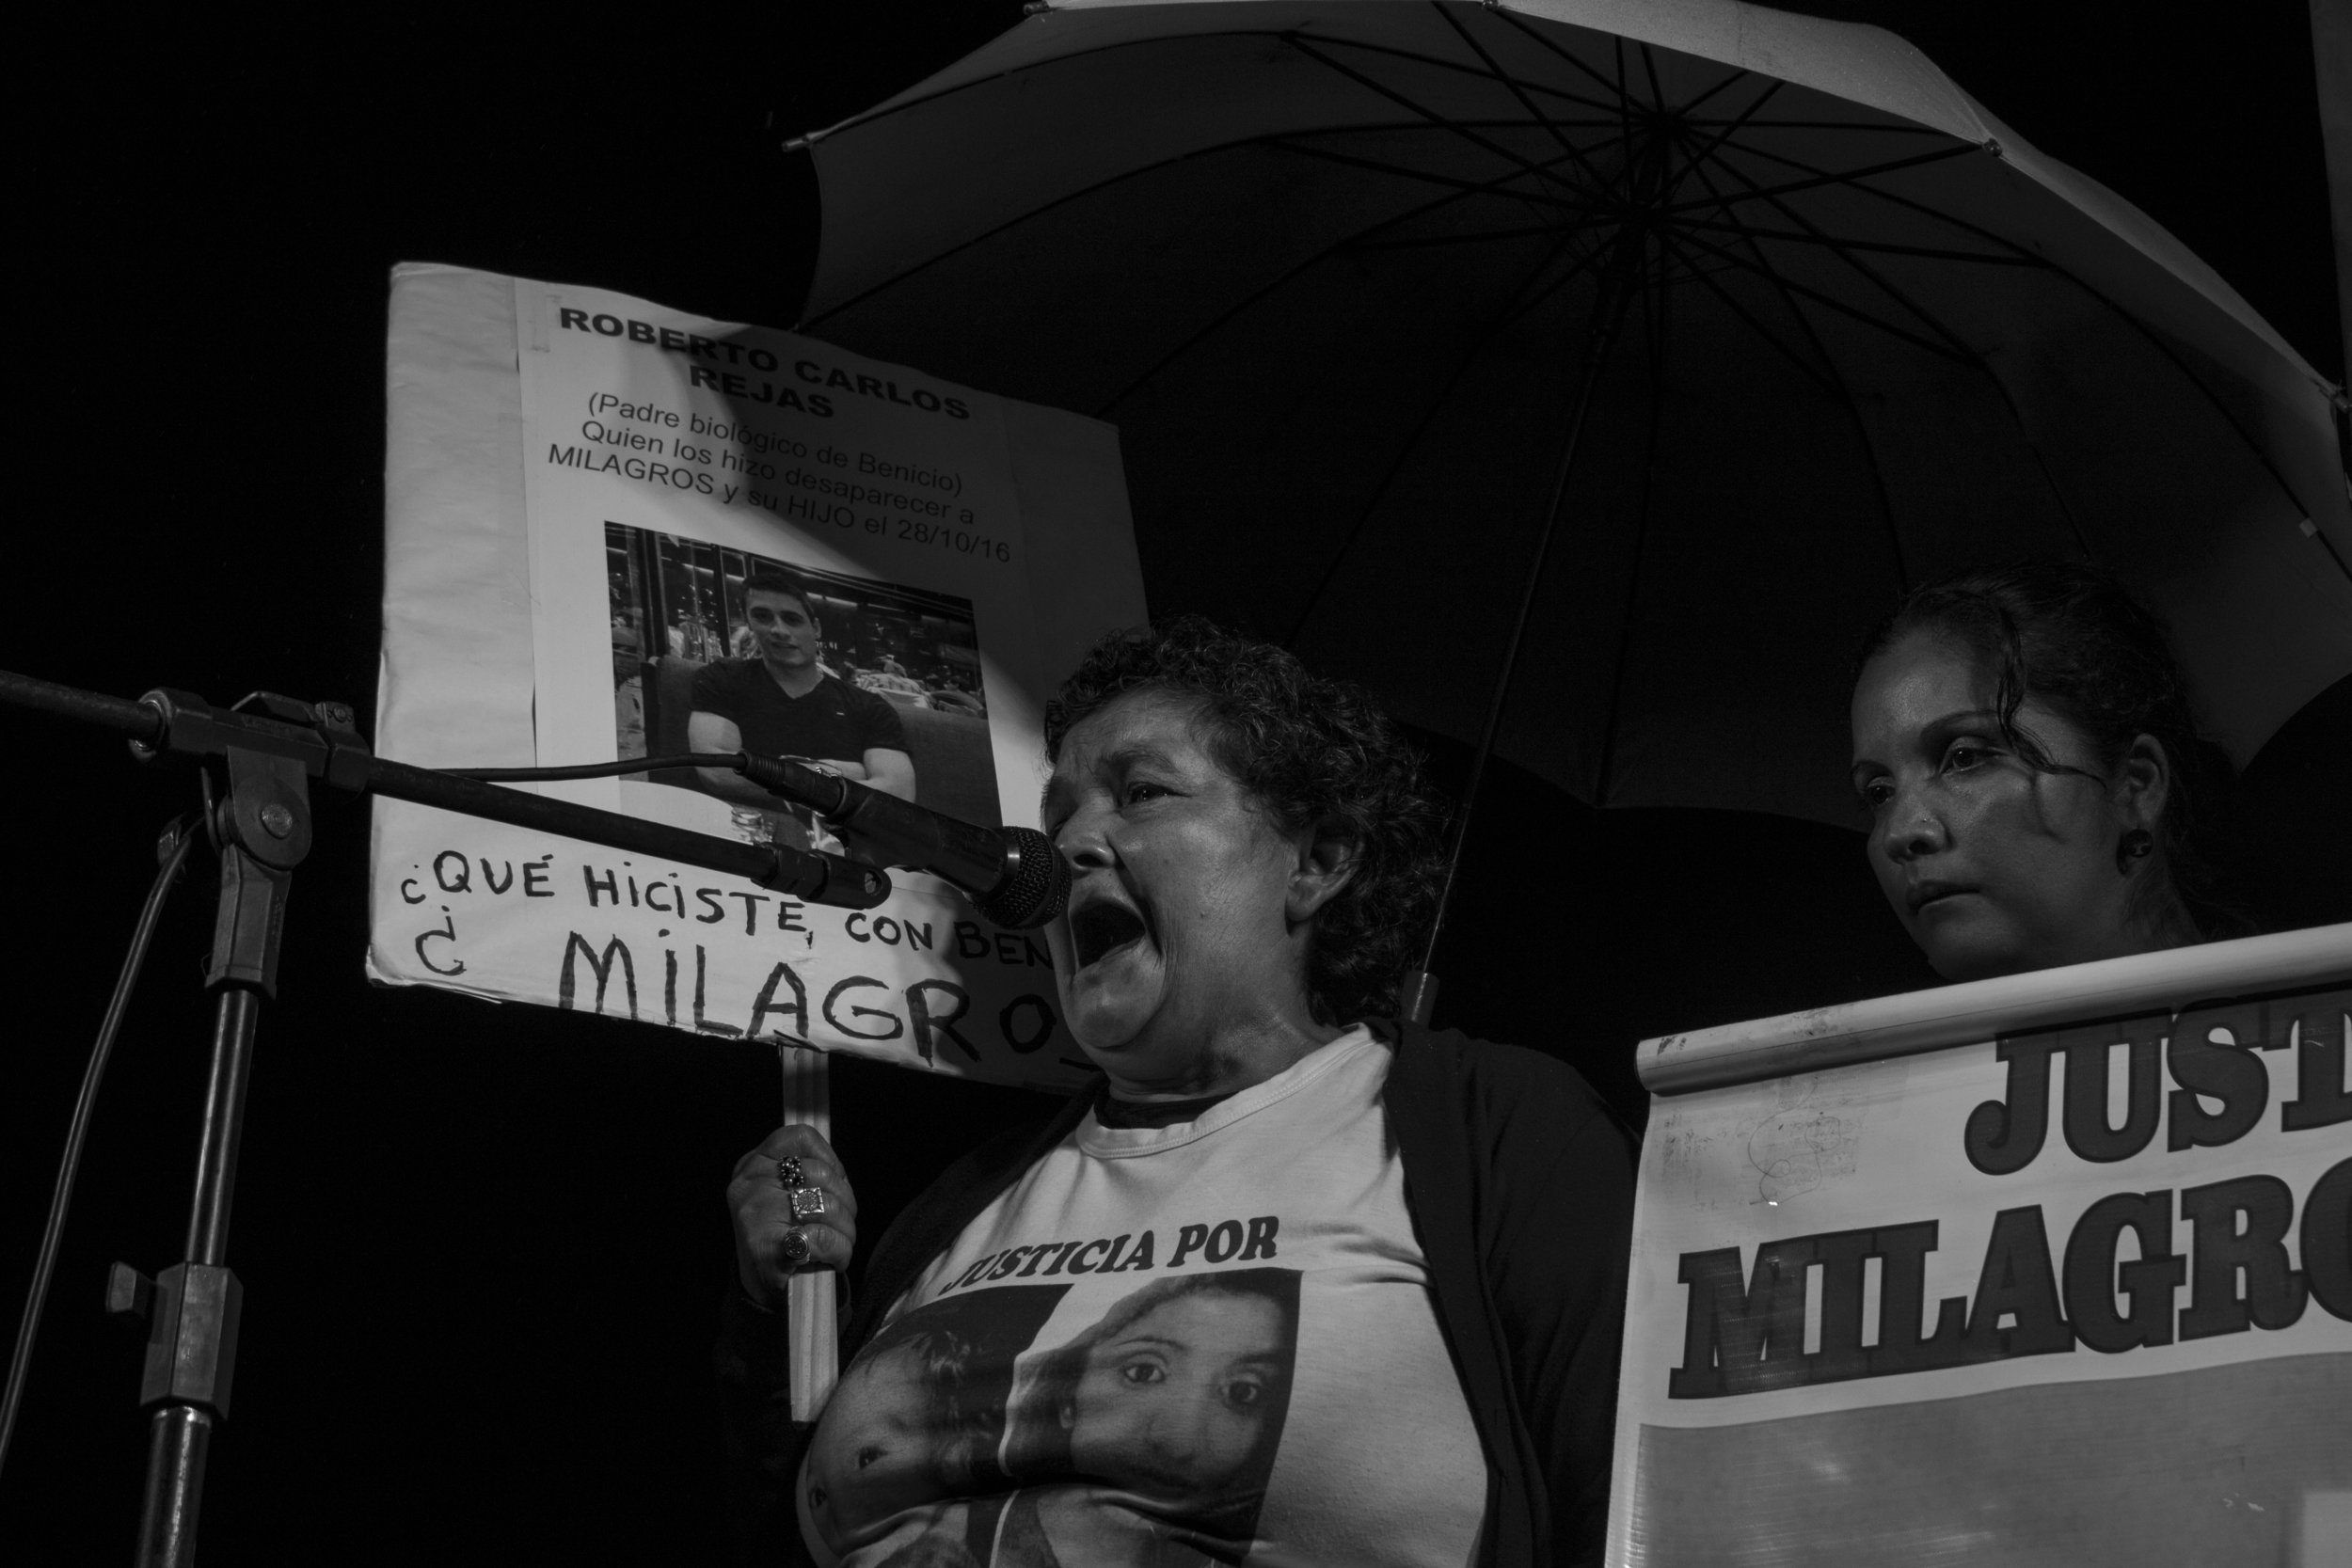 Marcha Plaza Independencia_La Palta_09.jpg